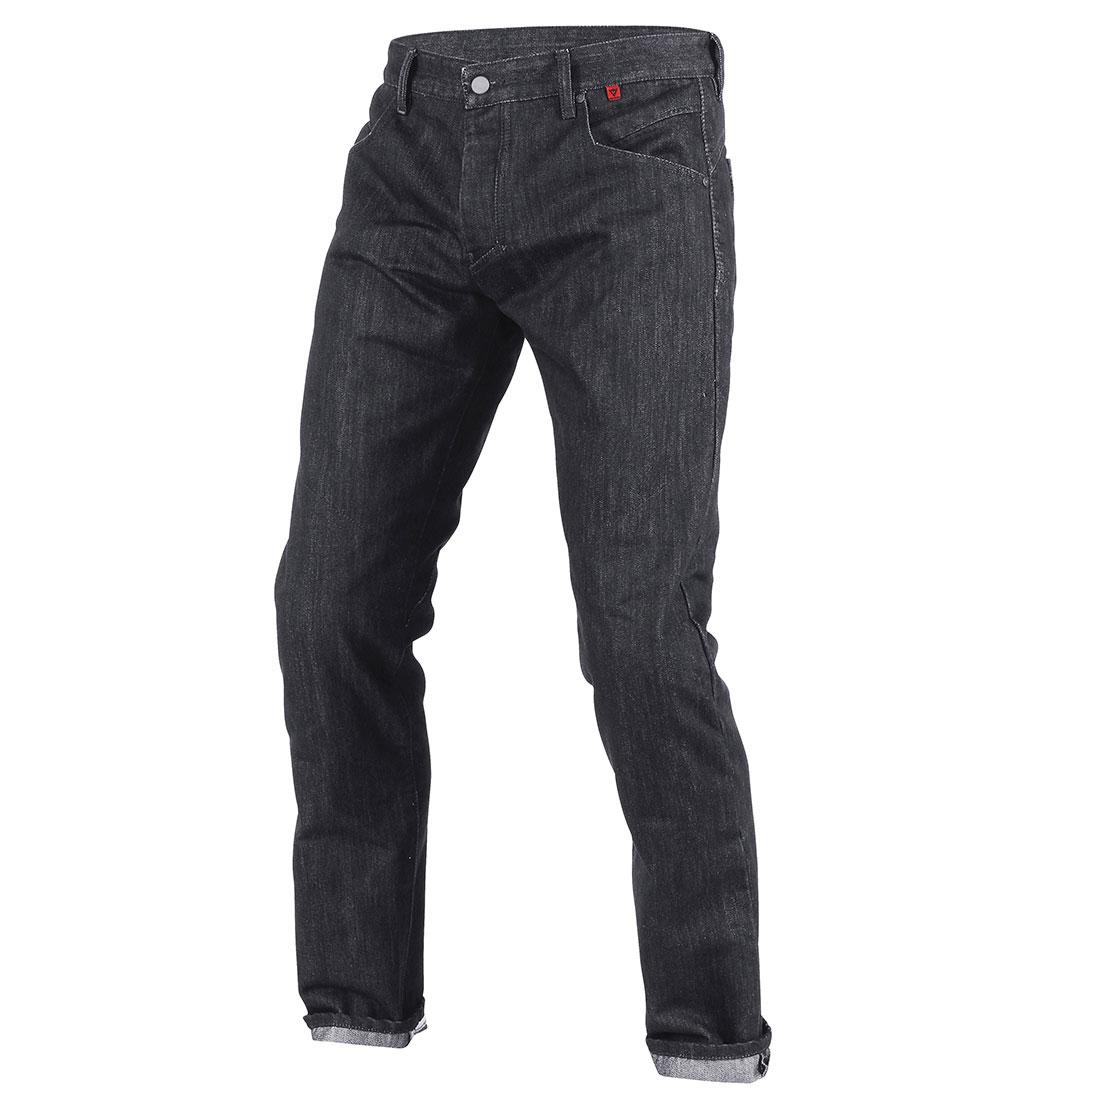 Dainese Strokeville Slim Jeans Aramid Denim Nero